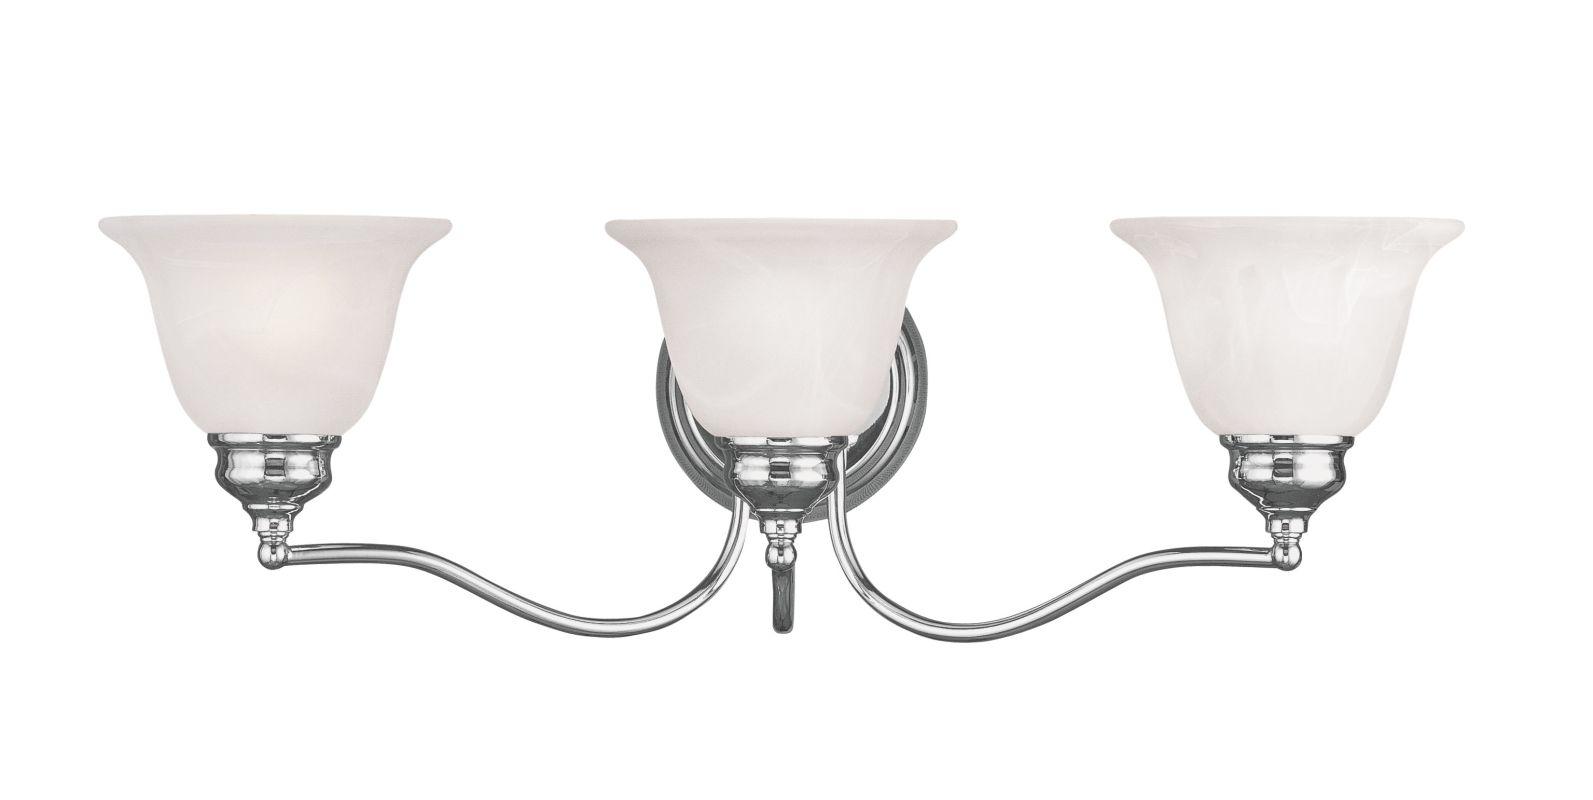 Livex Lighting 1353-05 Chrome Essex Bathroom Vanity Bar